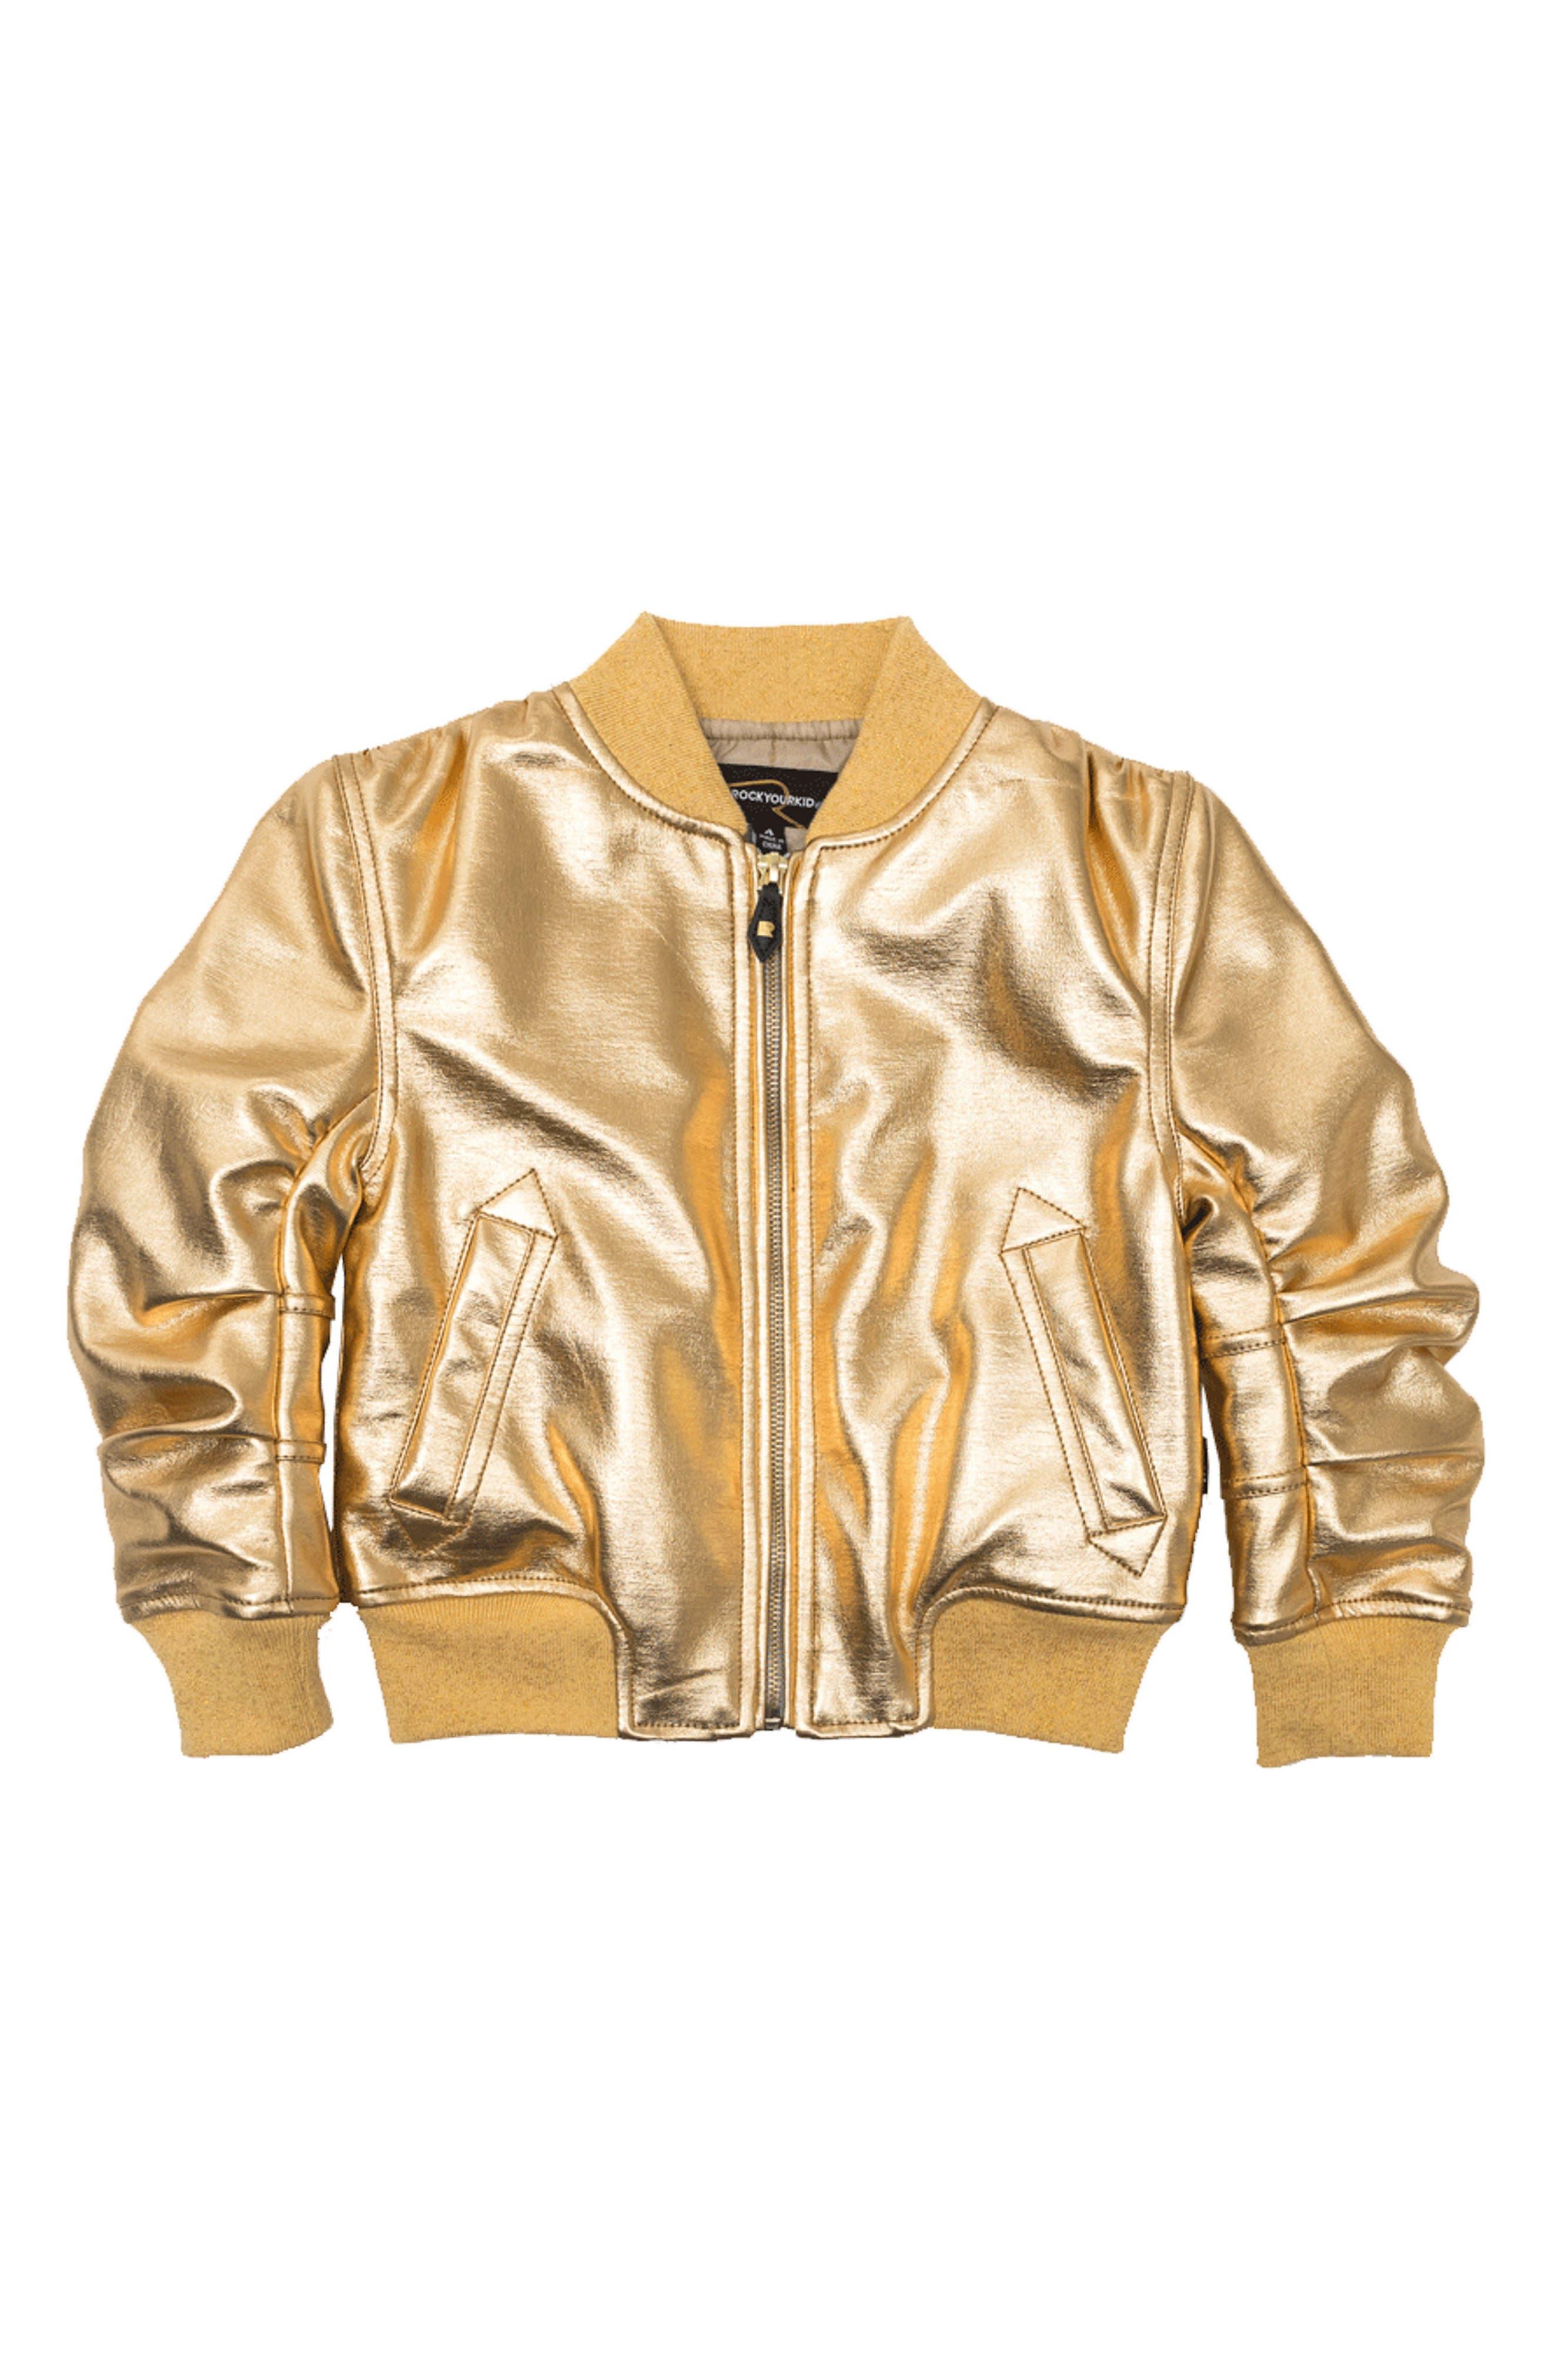 Studio 54 Bomber Jacket,                         Main,                         color, Gold